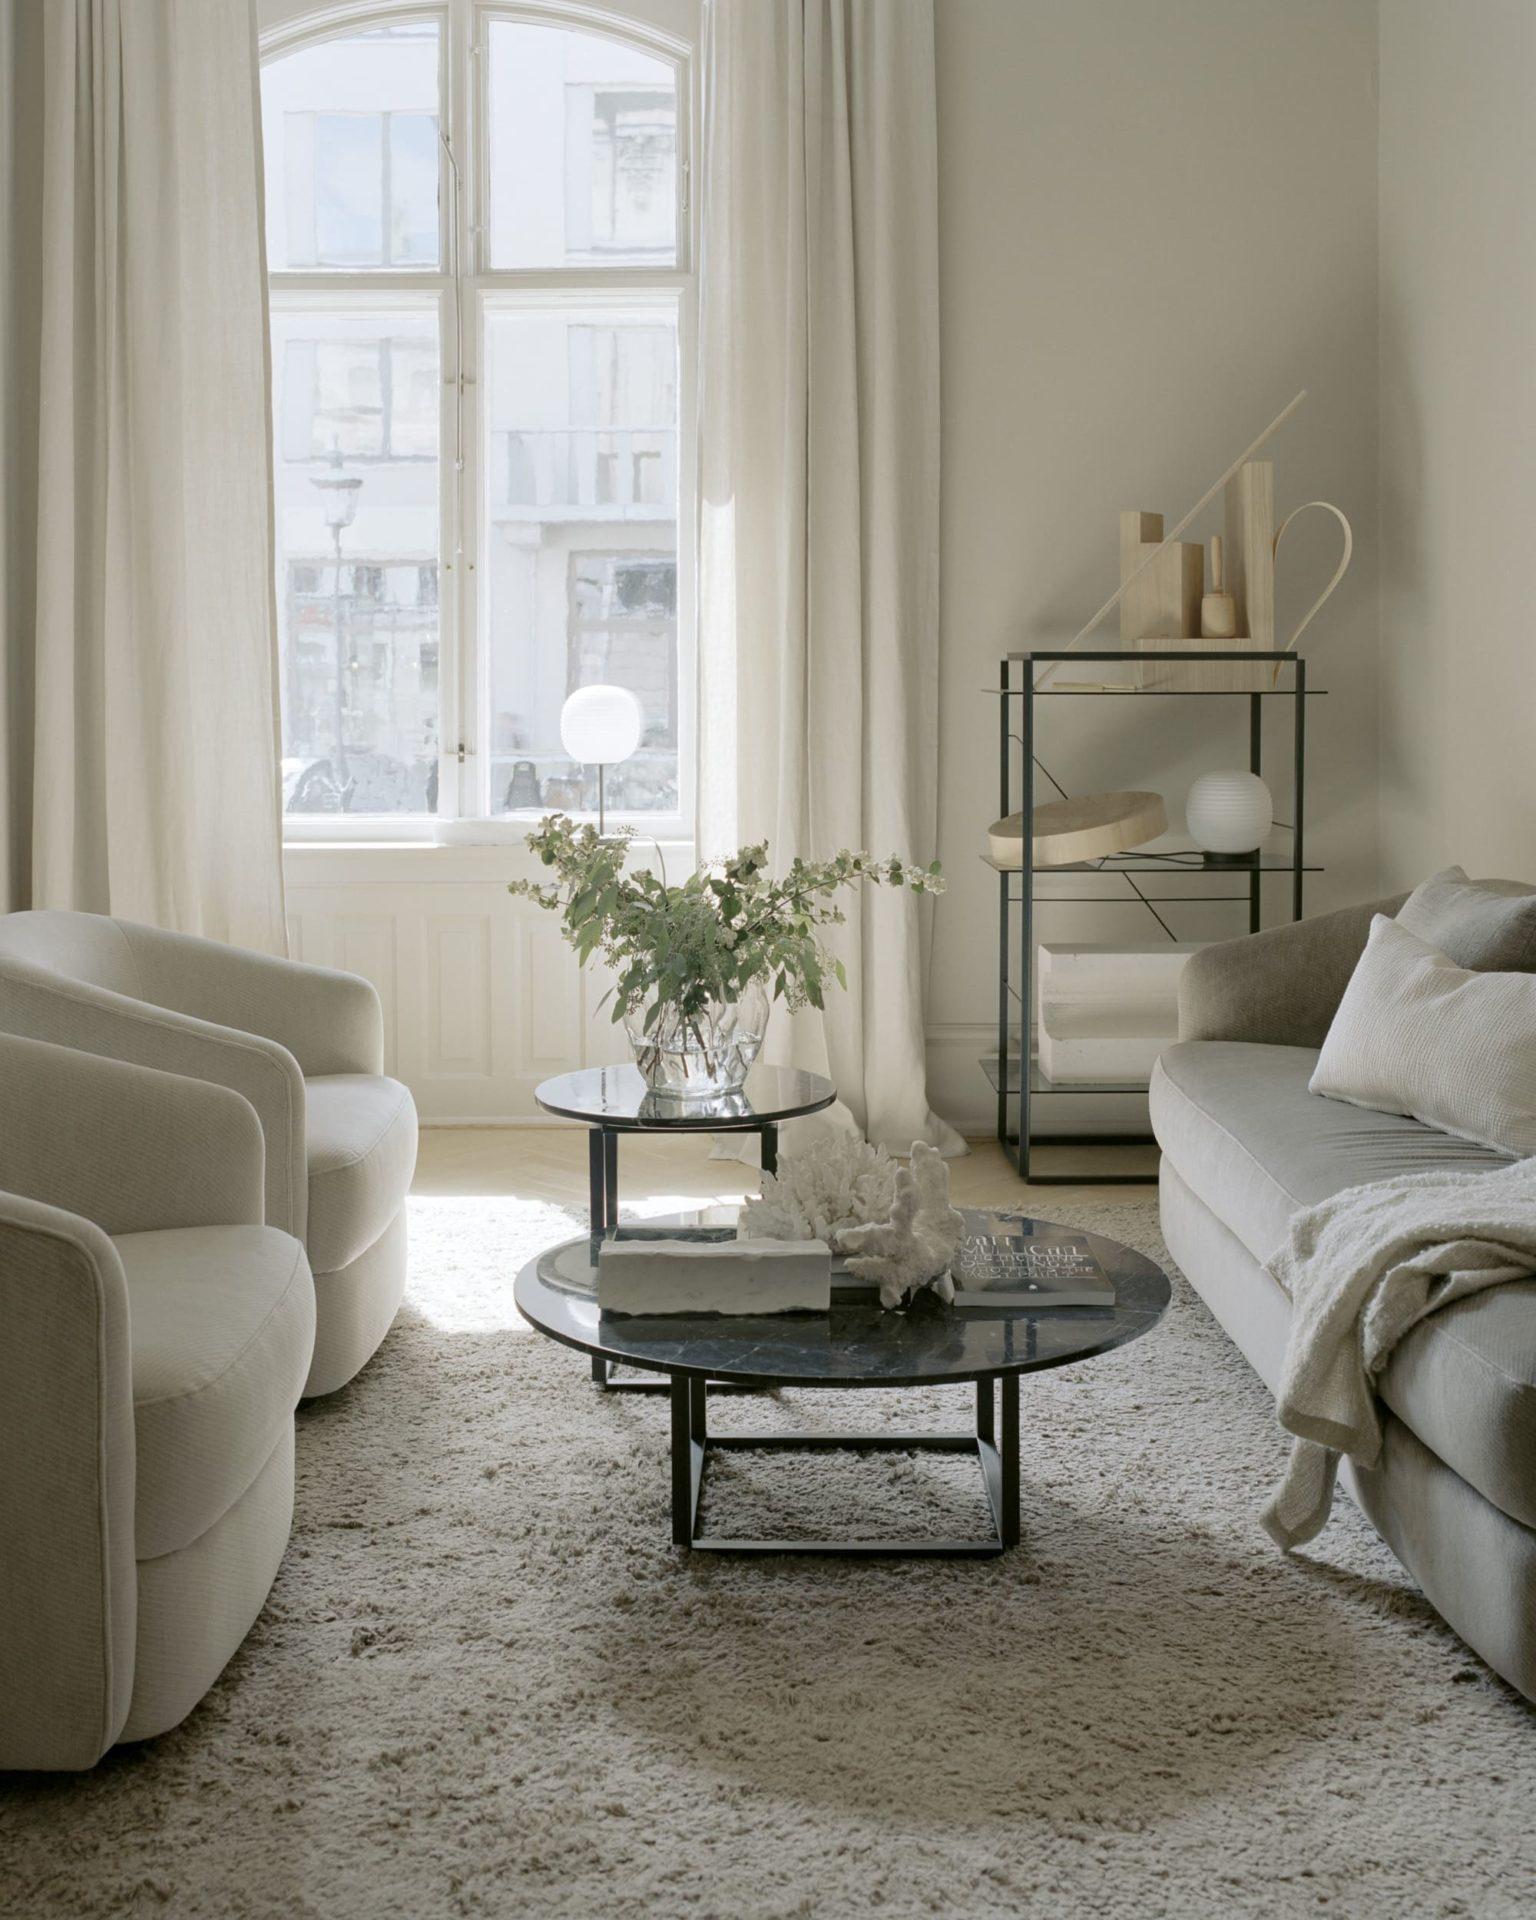 decoration-mur-kaki-salon-table-en-marbre